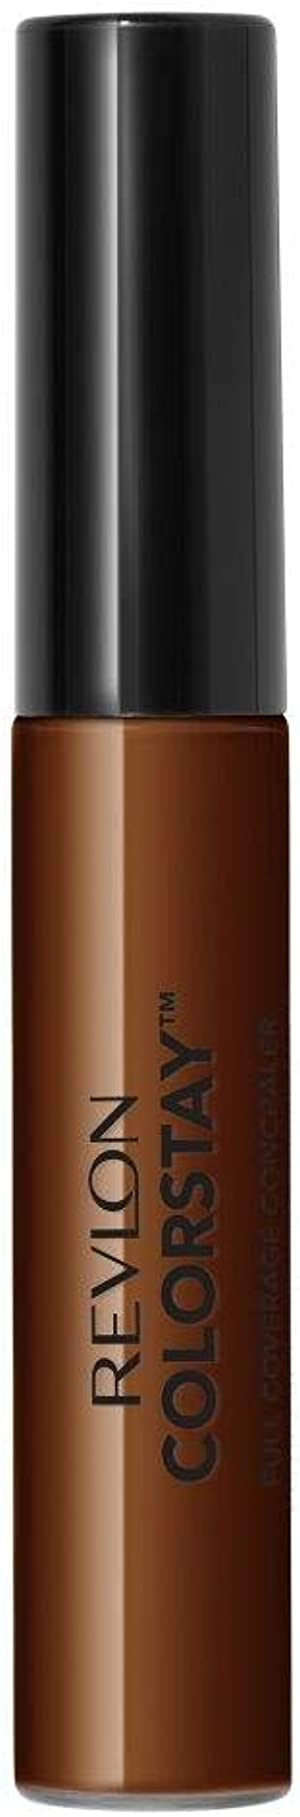 Revlon ColorStay Concealer, Longwearing Full Coverage Color Correcting Makeup, 080 Espresso, 0.21 oz